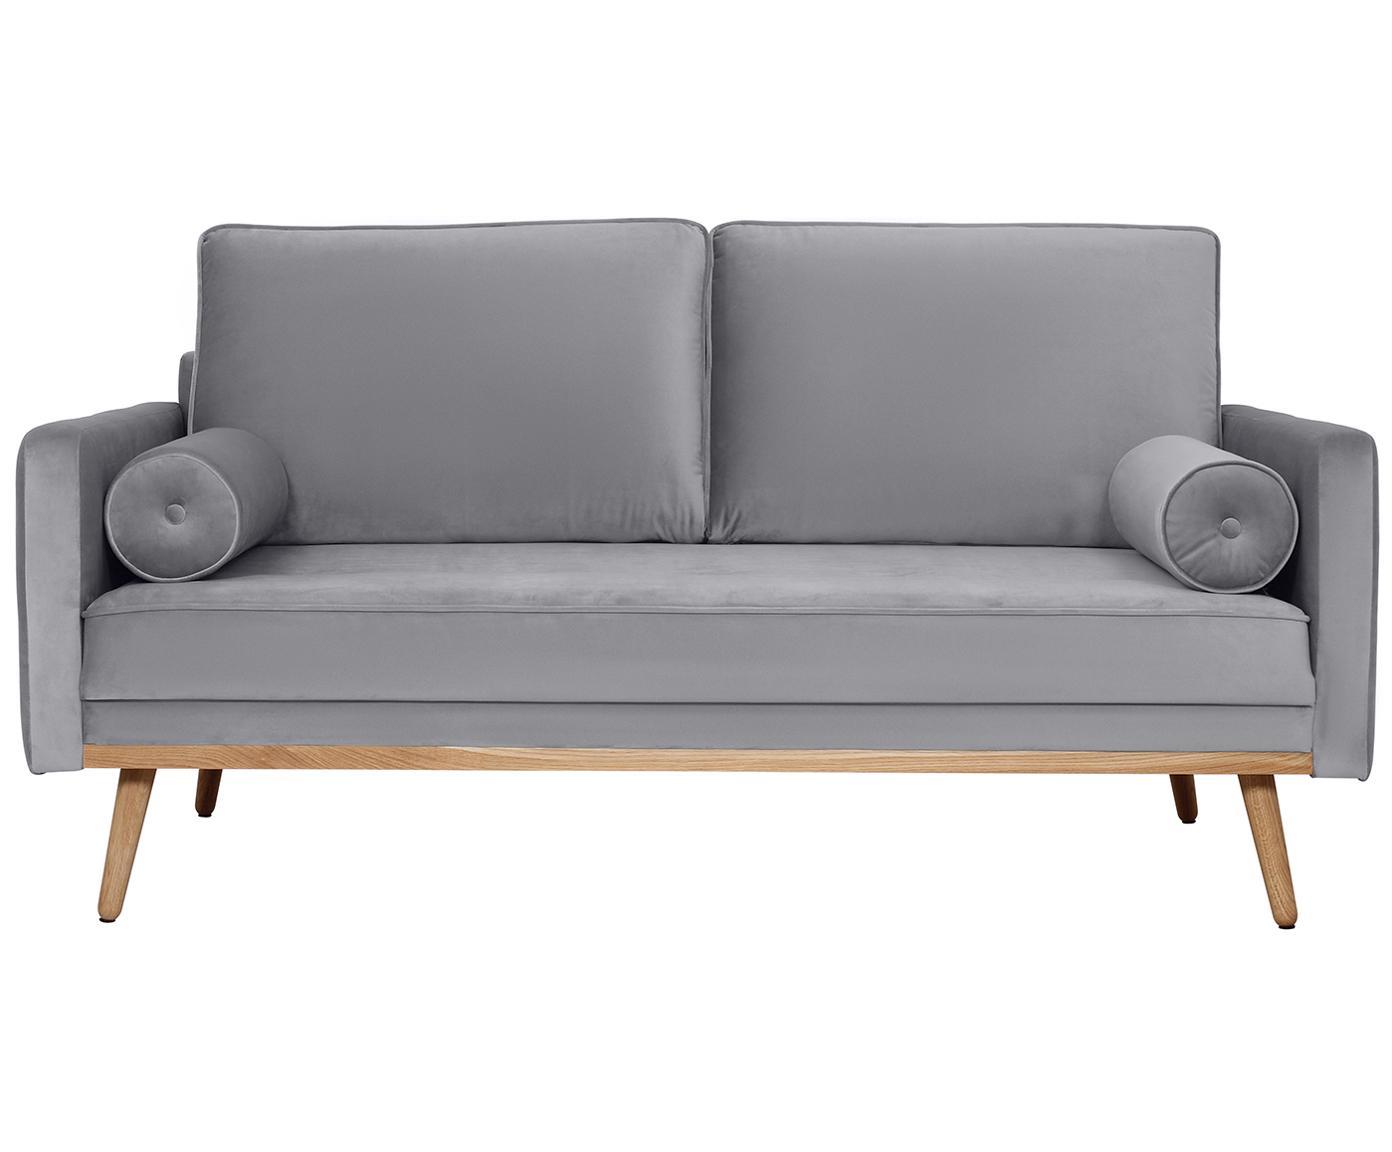 Samt-Sofa Saint (2-Sitzer), Bezug: Samt (Polyester) 35.000 S, Gestell: Massives Kiefernholz, Spa, Samt Grau, B 169 x T 87 cm